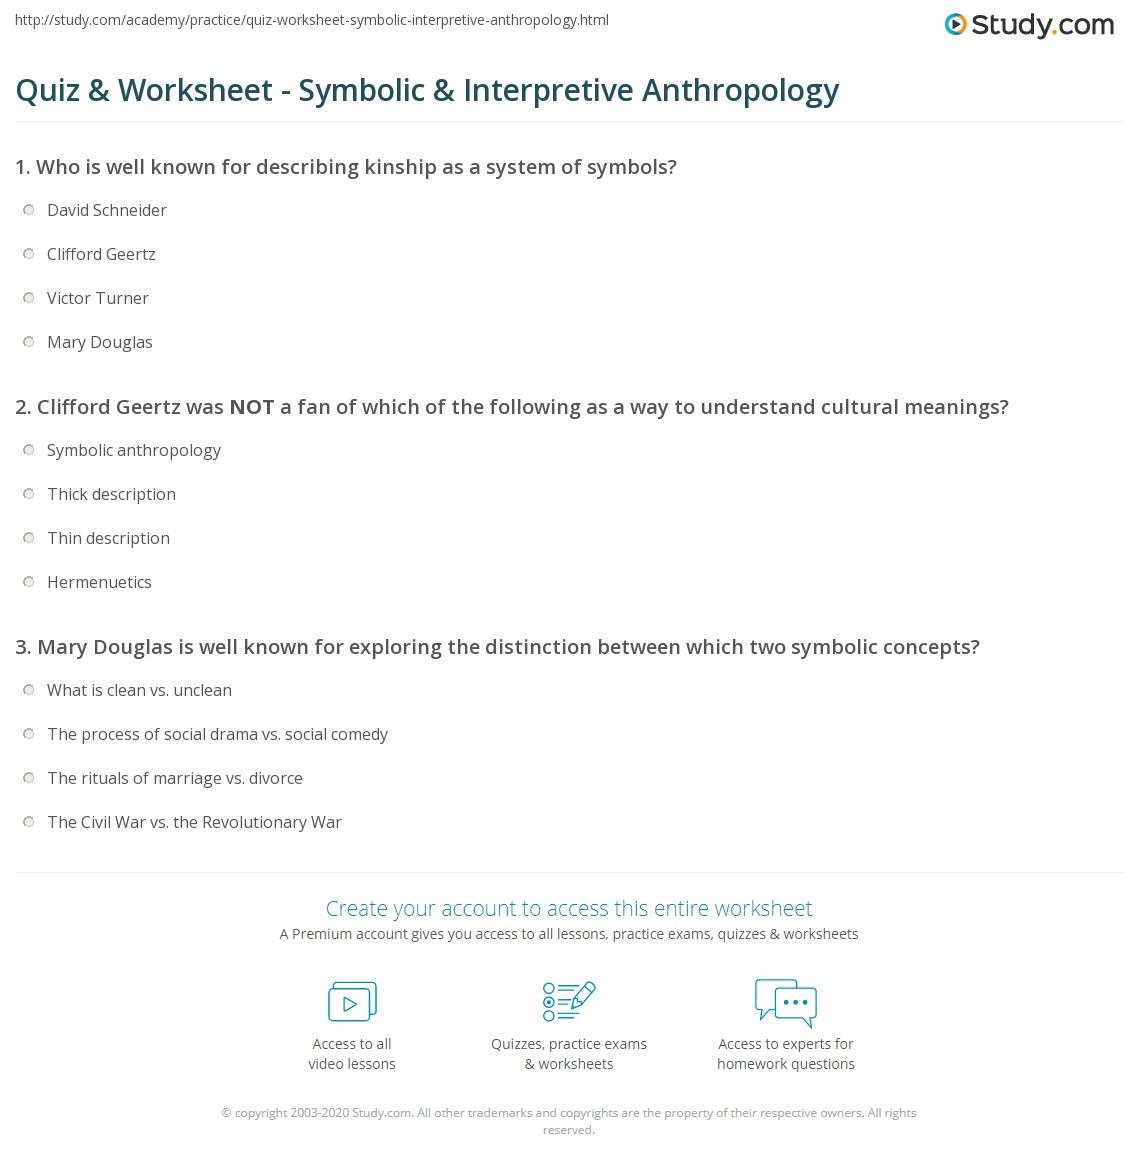 Quiz Worksheet Symbolic Interpretive Anthropology Study